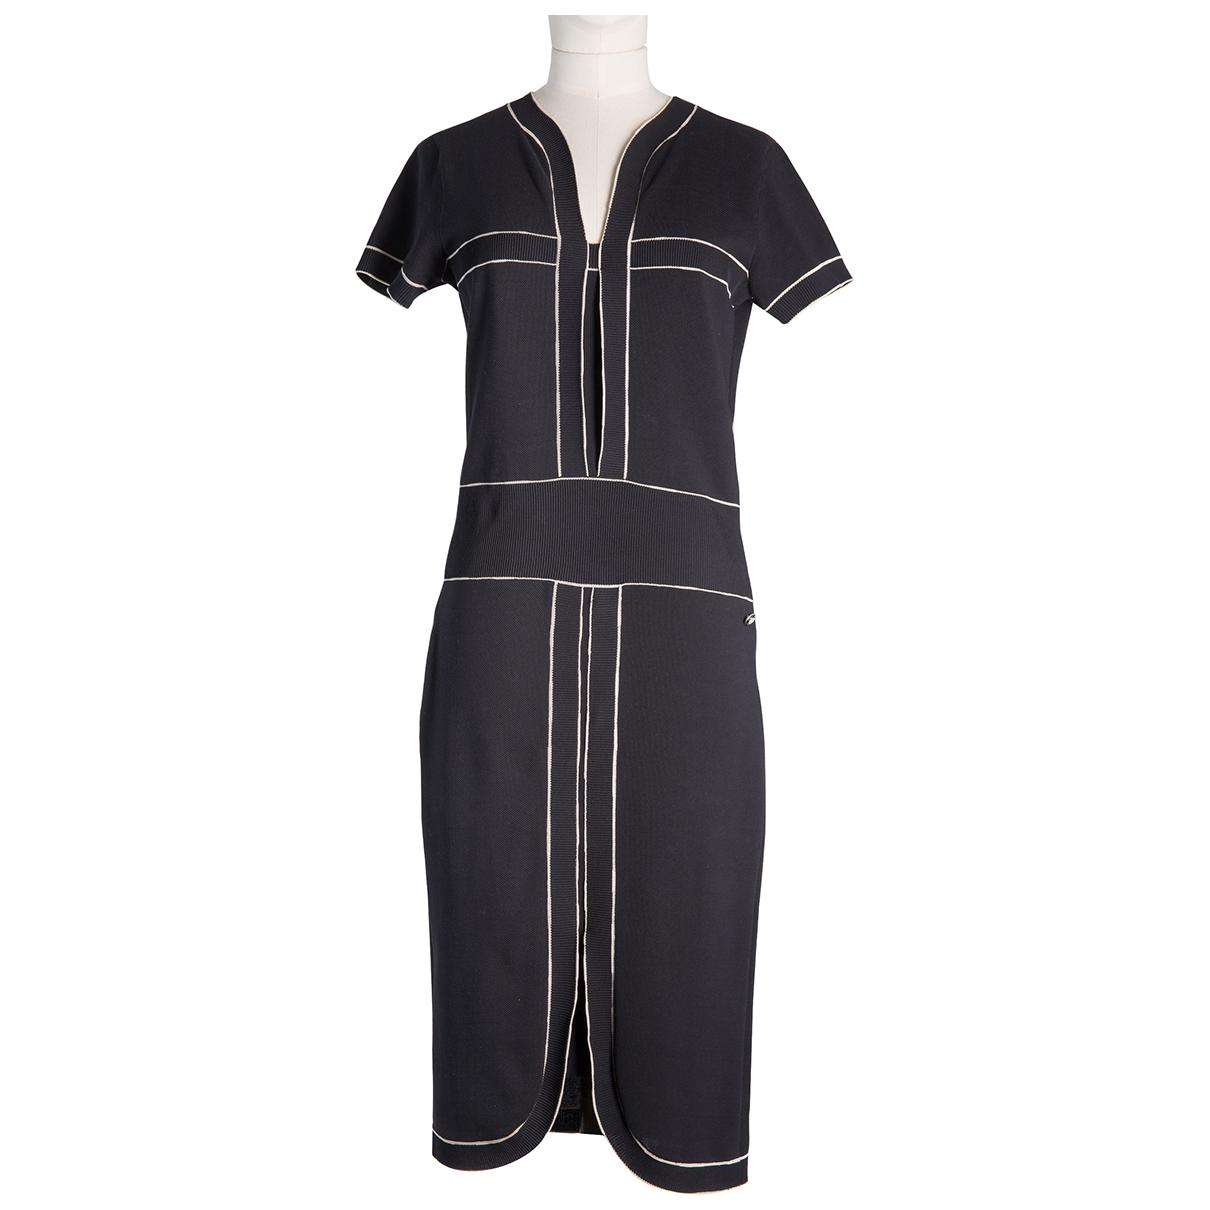 Chanel \N Black Cotton dress for Women 34 FR